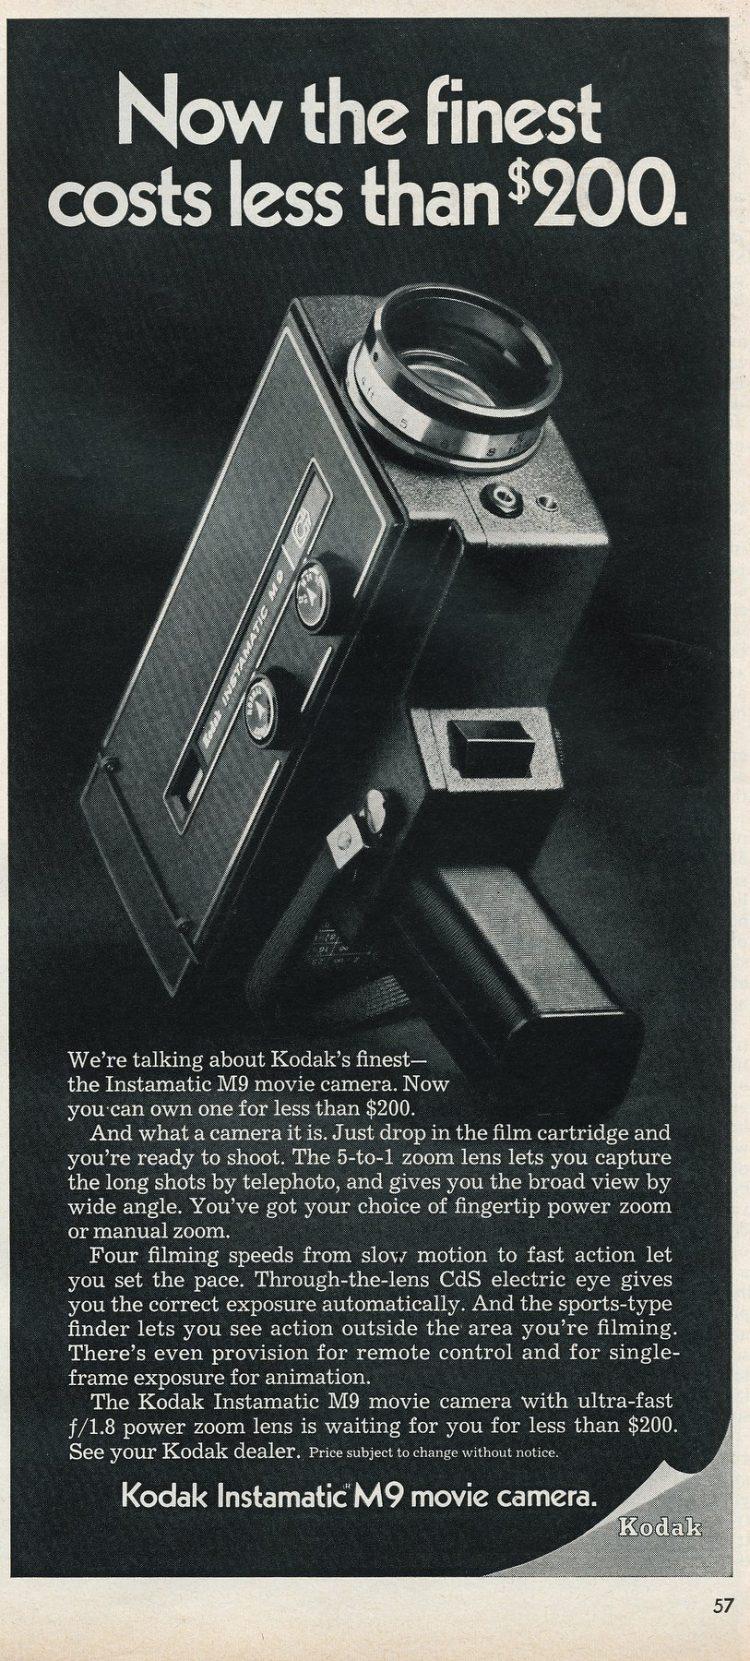 Vintage Kodak Instamatic M9 Movie Camera from 1969